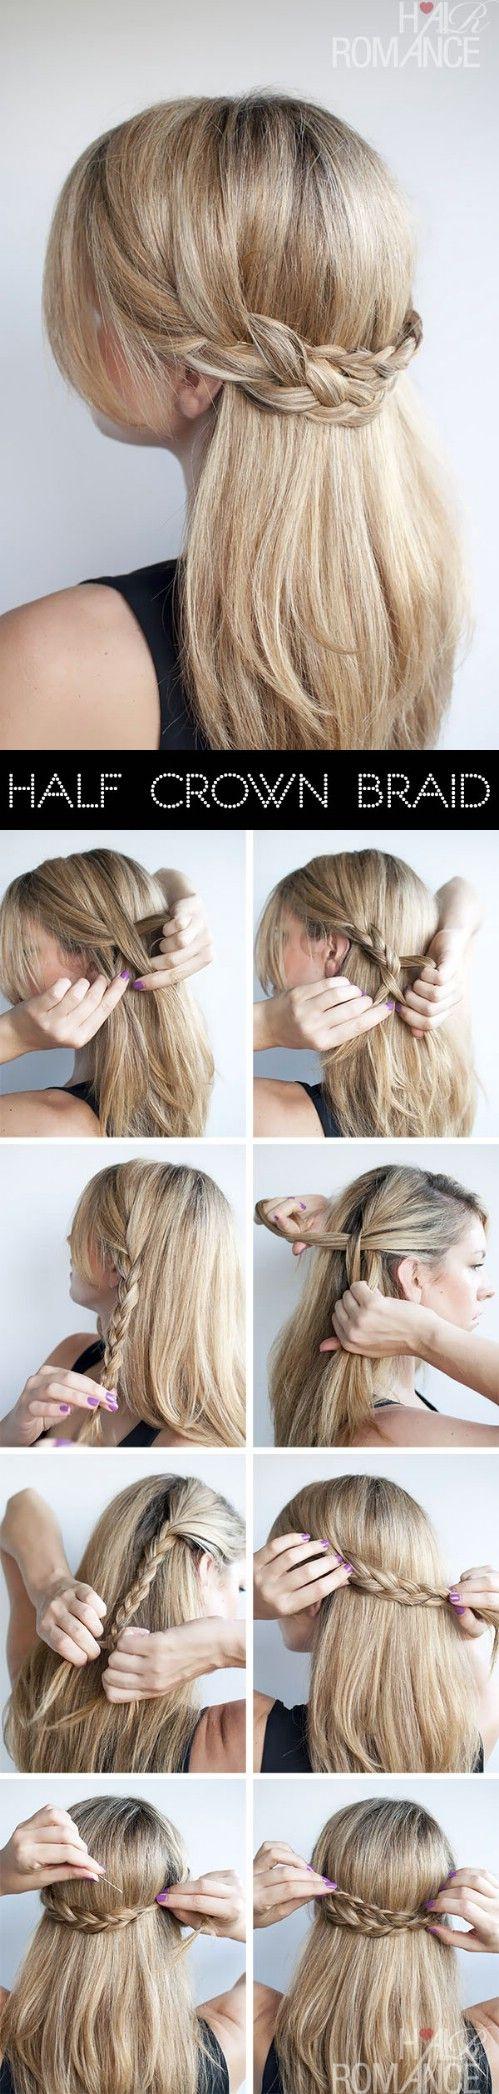 best 25+ 5 minute hairstyles ideas on pinterest   beach hair